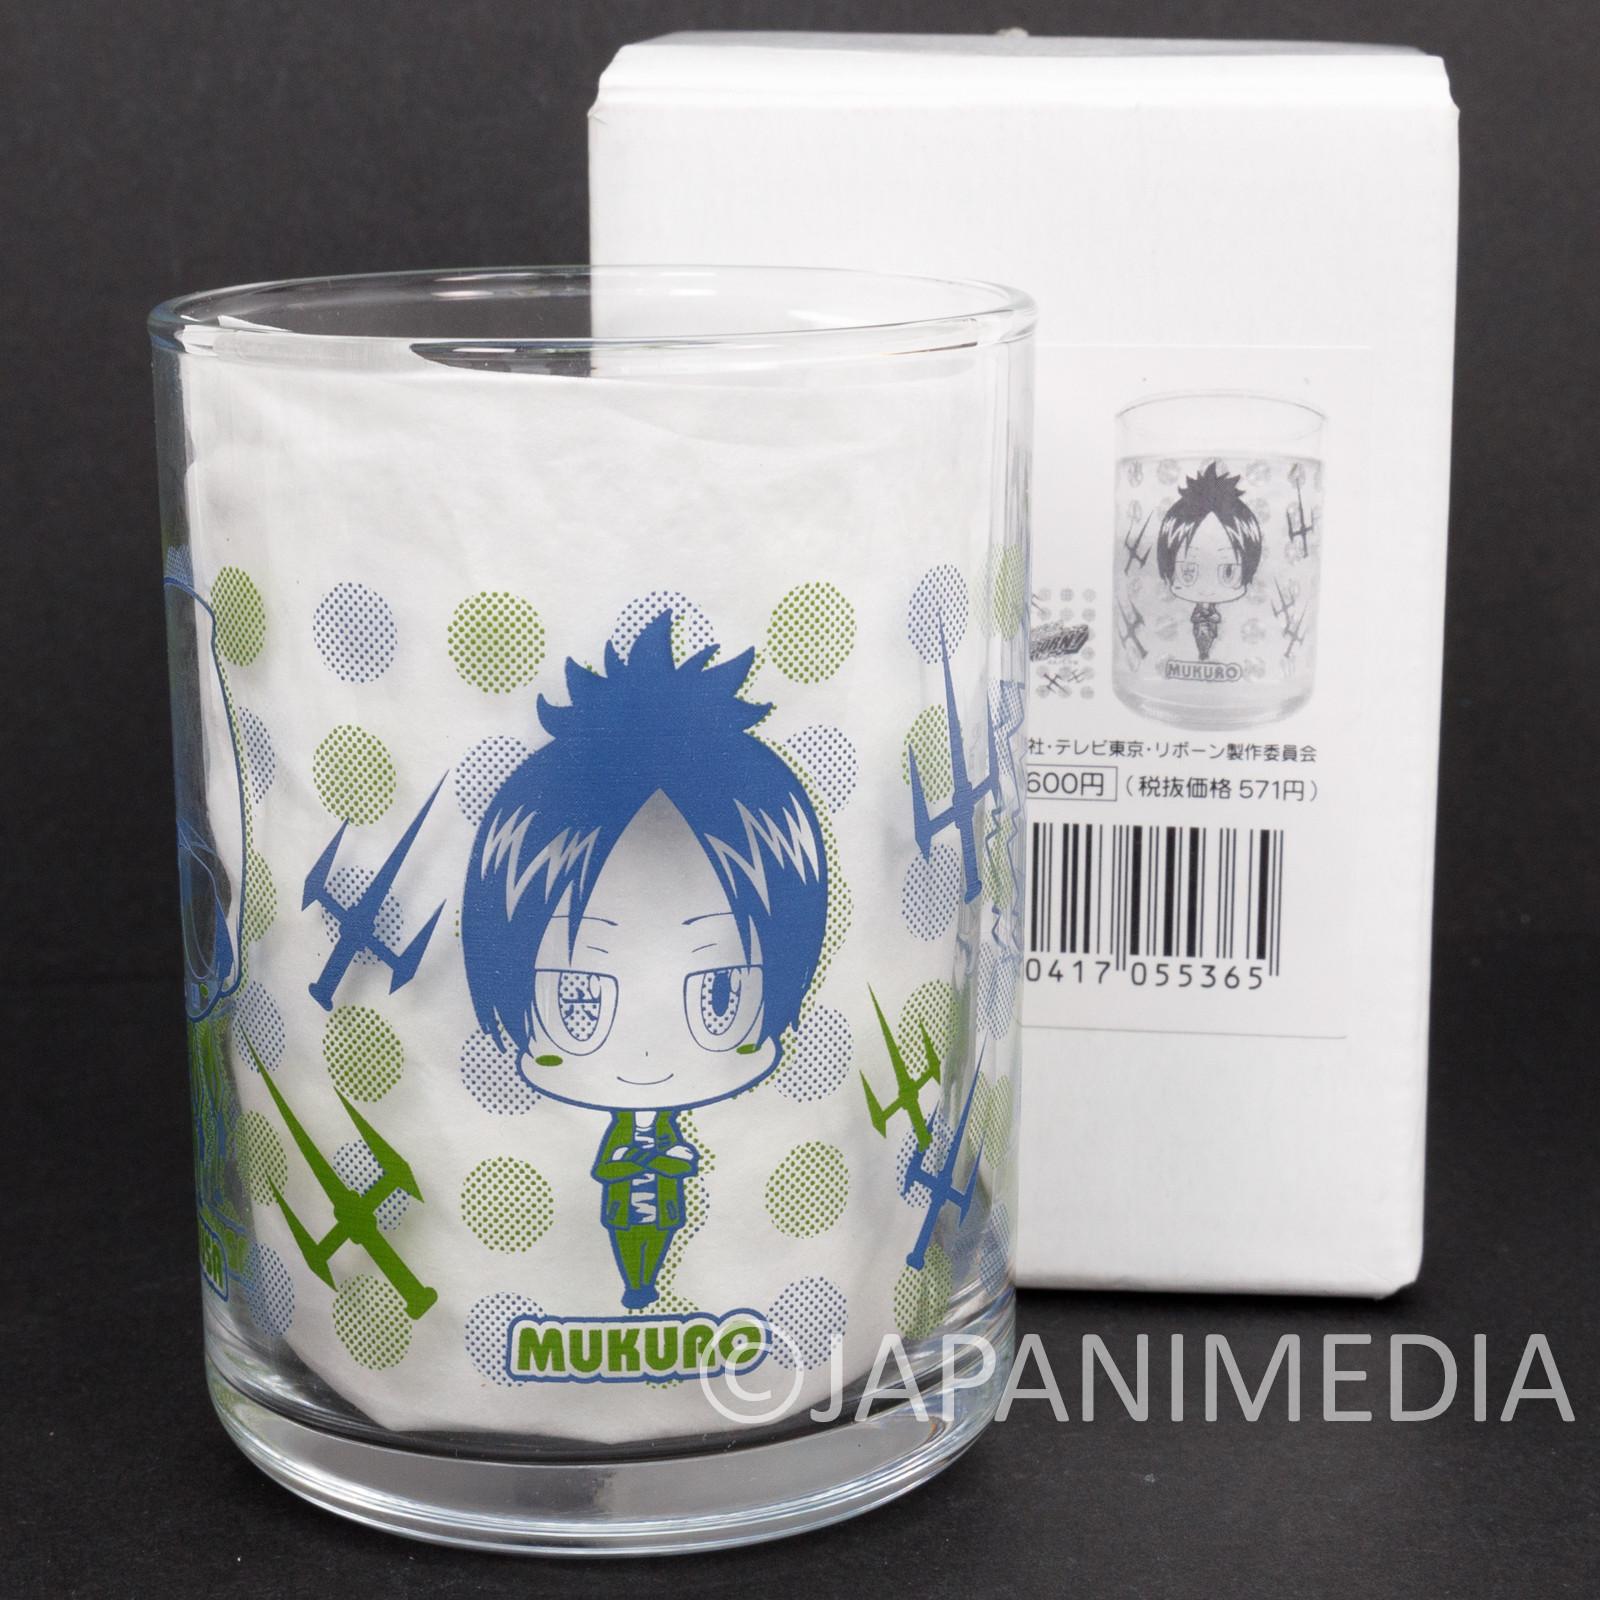 Katekyo Hitman Reborn Kokuyo Junior High School Glass JAPAN ANIME SHONEN JUMP